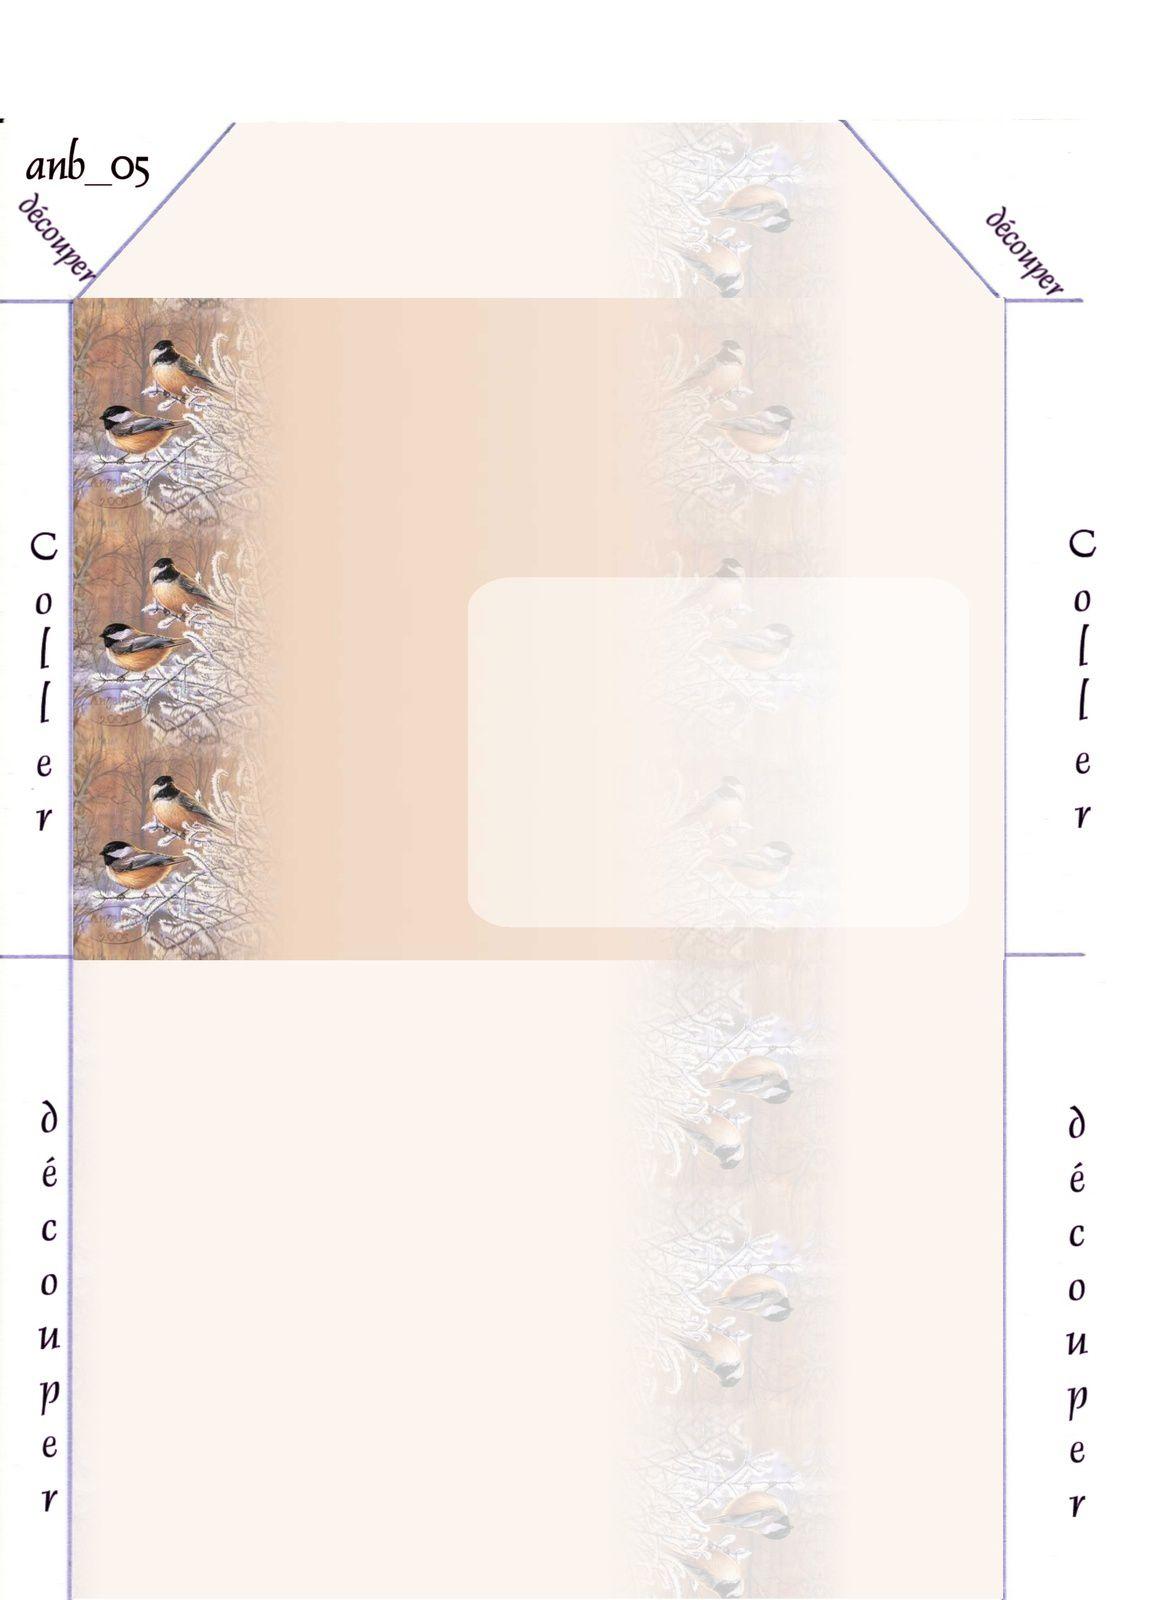 Oiseaux Incredimail &amp&#x3B; Papier A4 h l &amp&#x3B; outlook &amp&#x3B; enveloppe &amp&#x3B; 2 cartes A5 &amp&#x3B; signets 3 langues   apindex085_brucemiller